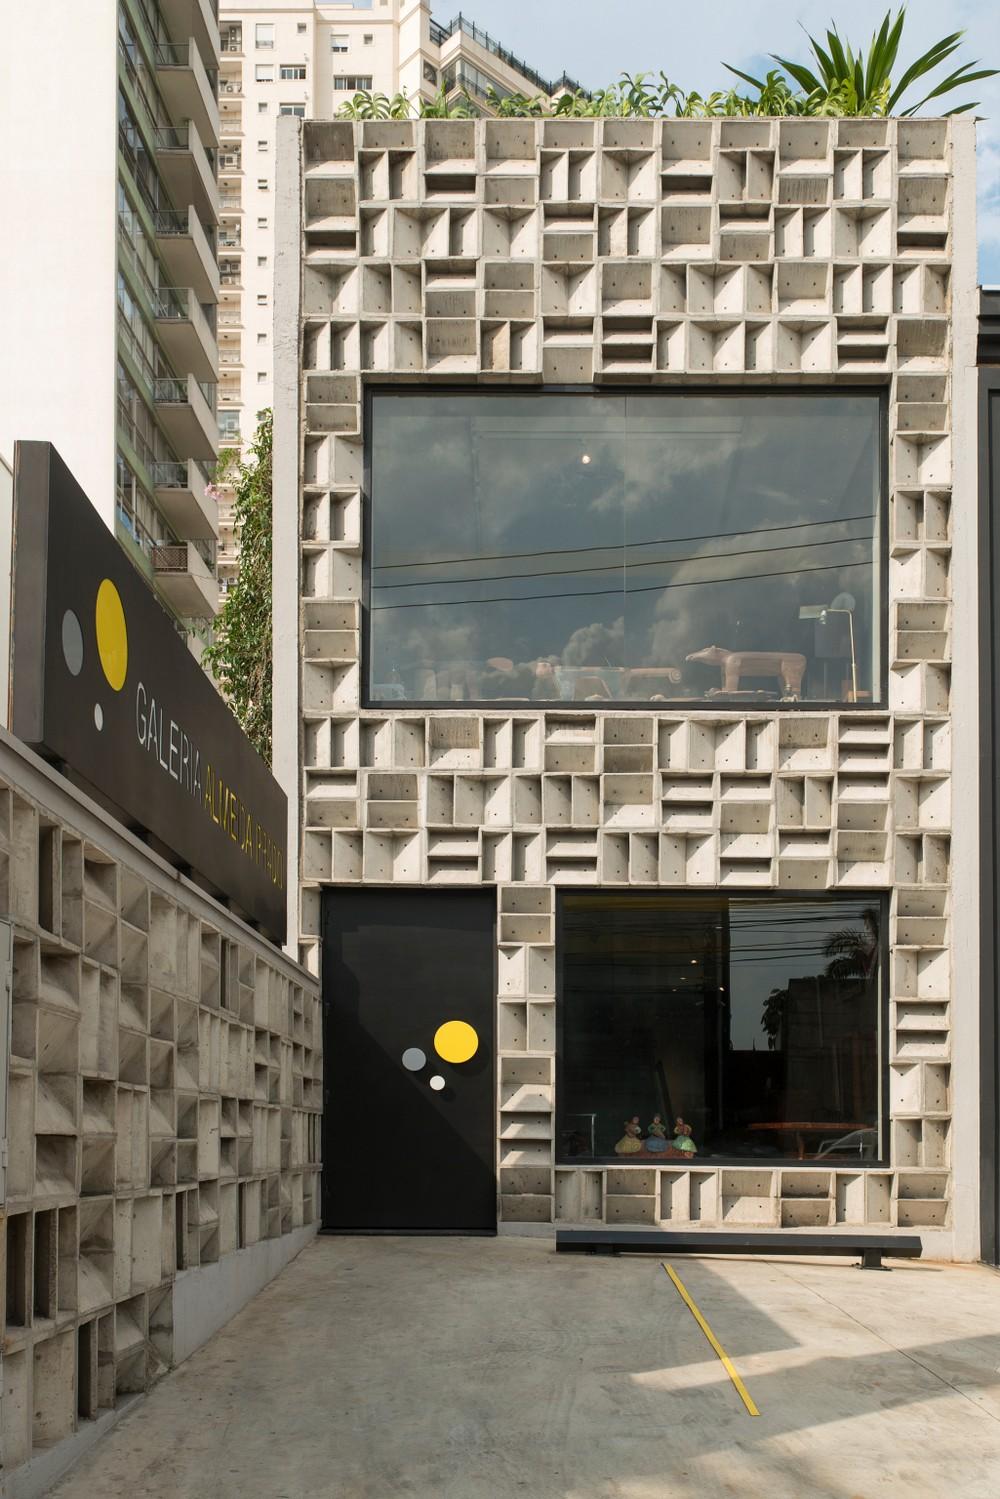 best interior design showrooms in são paulo Best Interior Design Showrooms in São Paulo galeria almeida prado